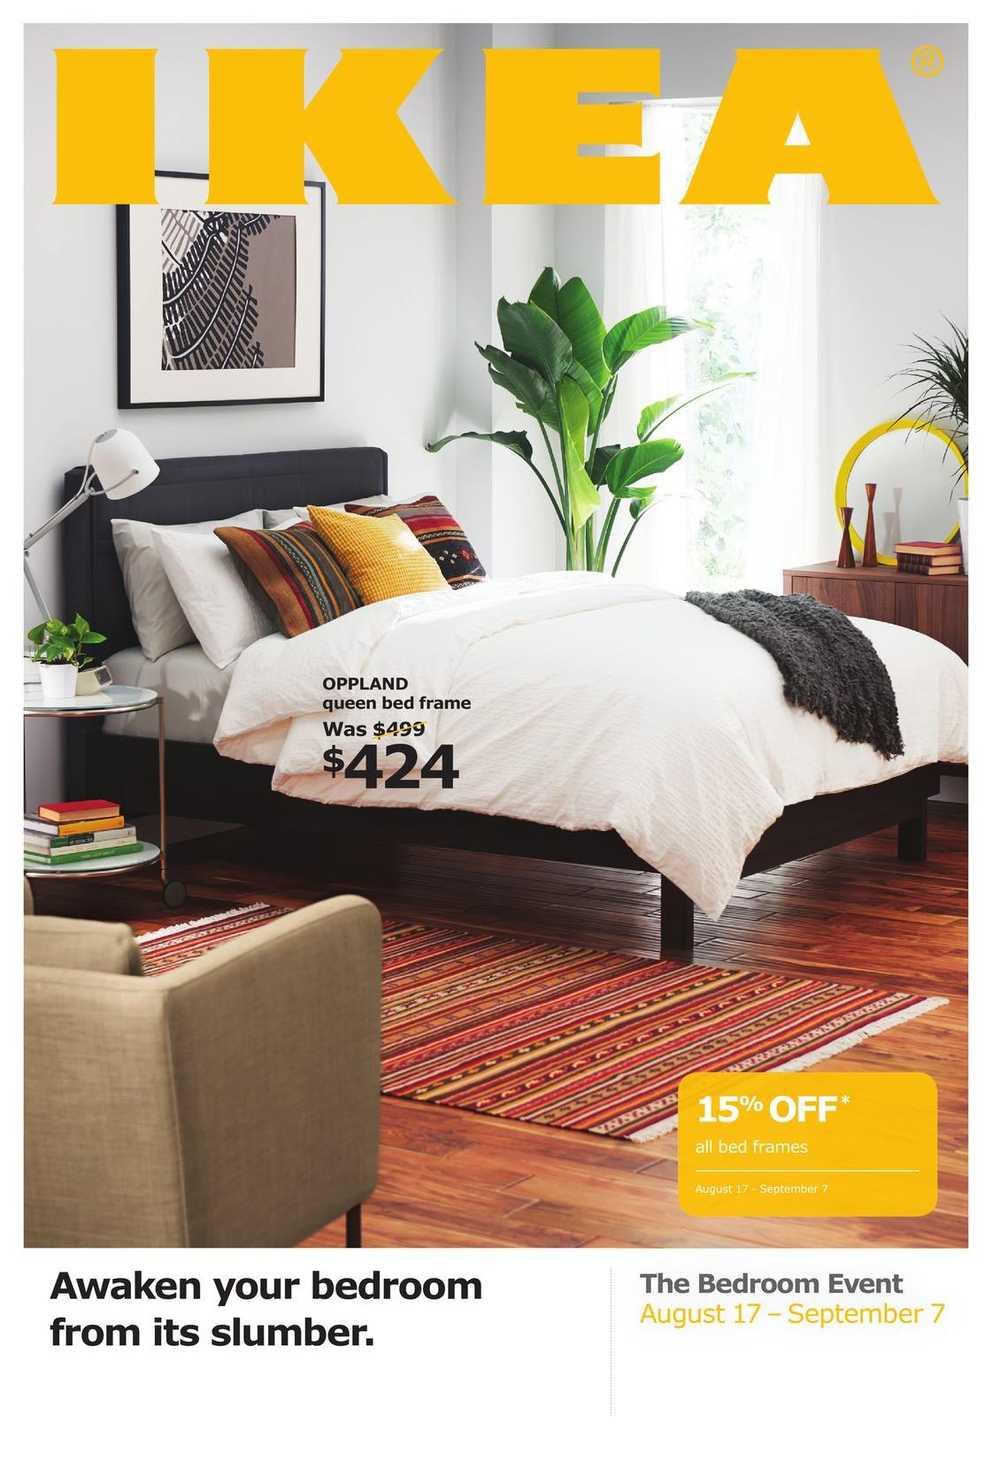 Ikea Bedroom Event Flyer August 17 To September 7 Canada